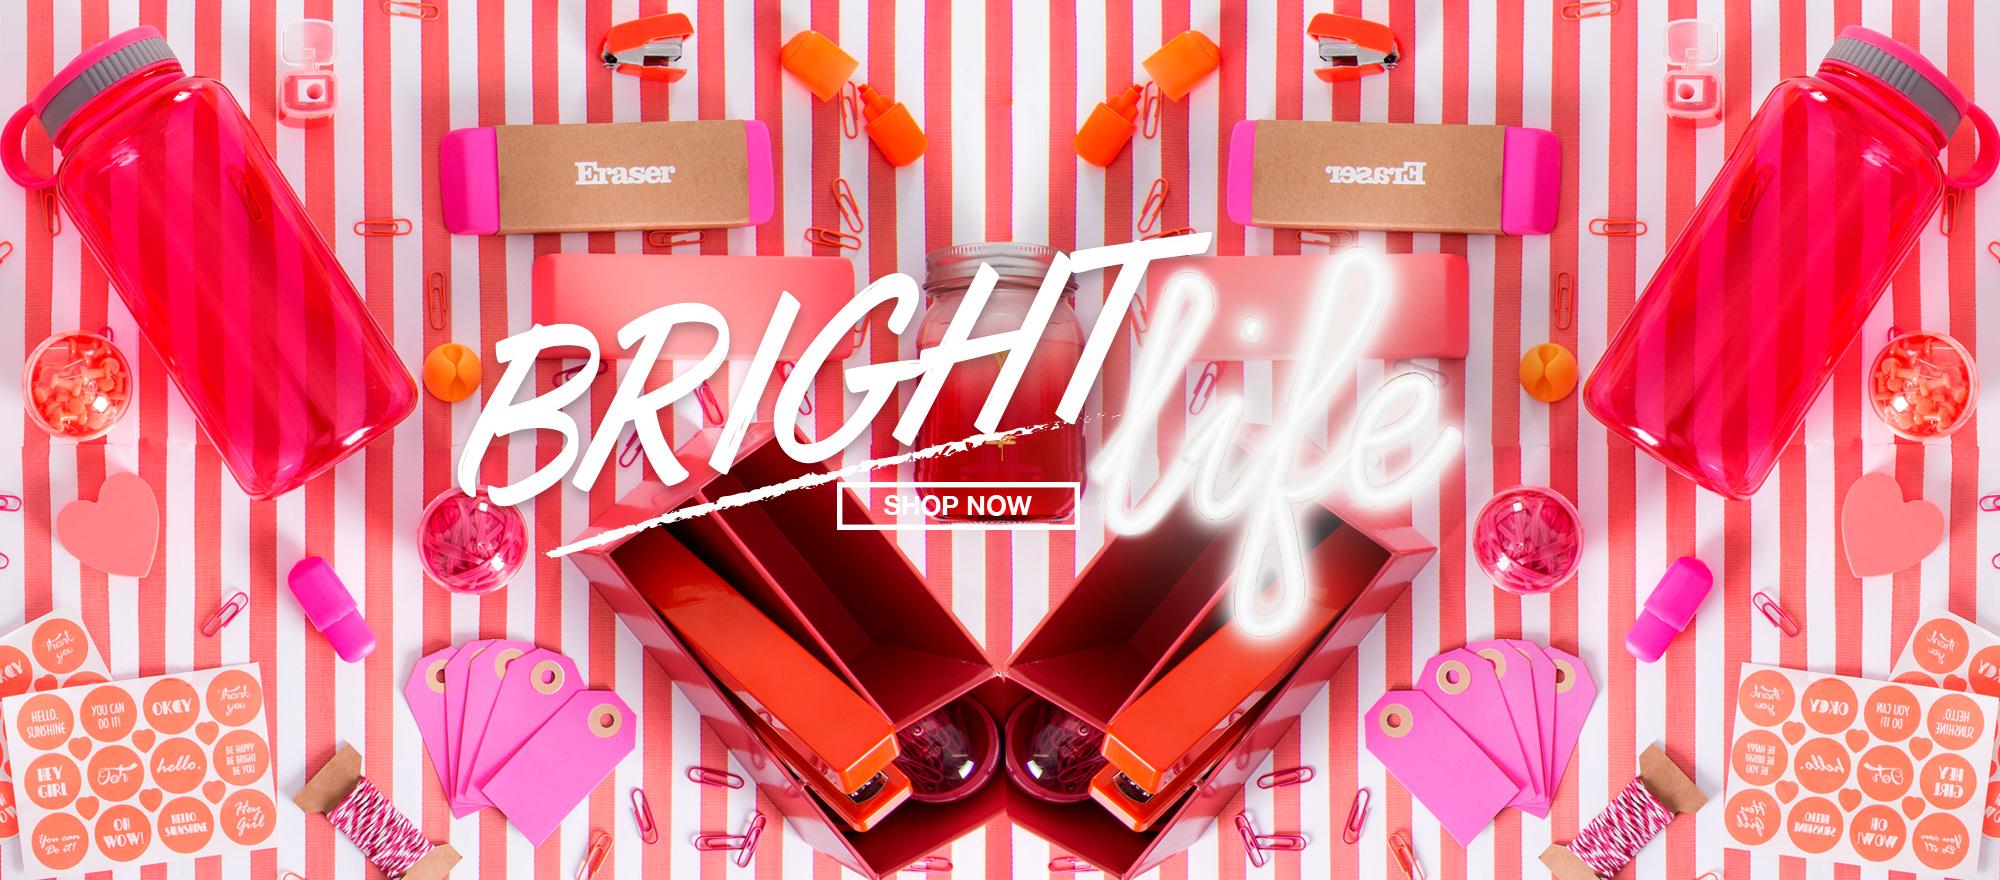 bright life pink